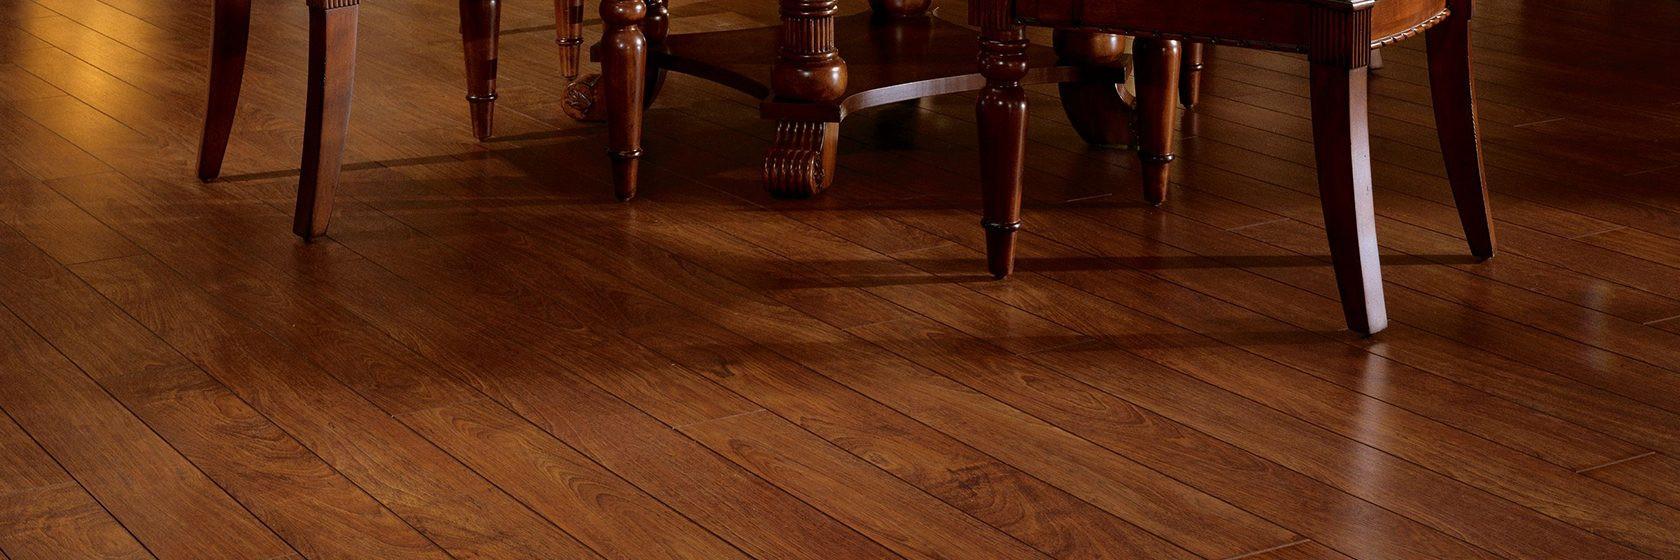 laminate flooring vs hardwood vs engineered of laminate exotic olive ash l8708 for hero l 1680 560